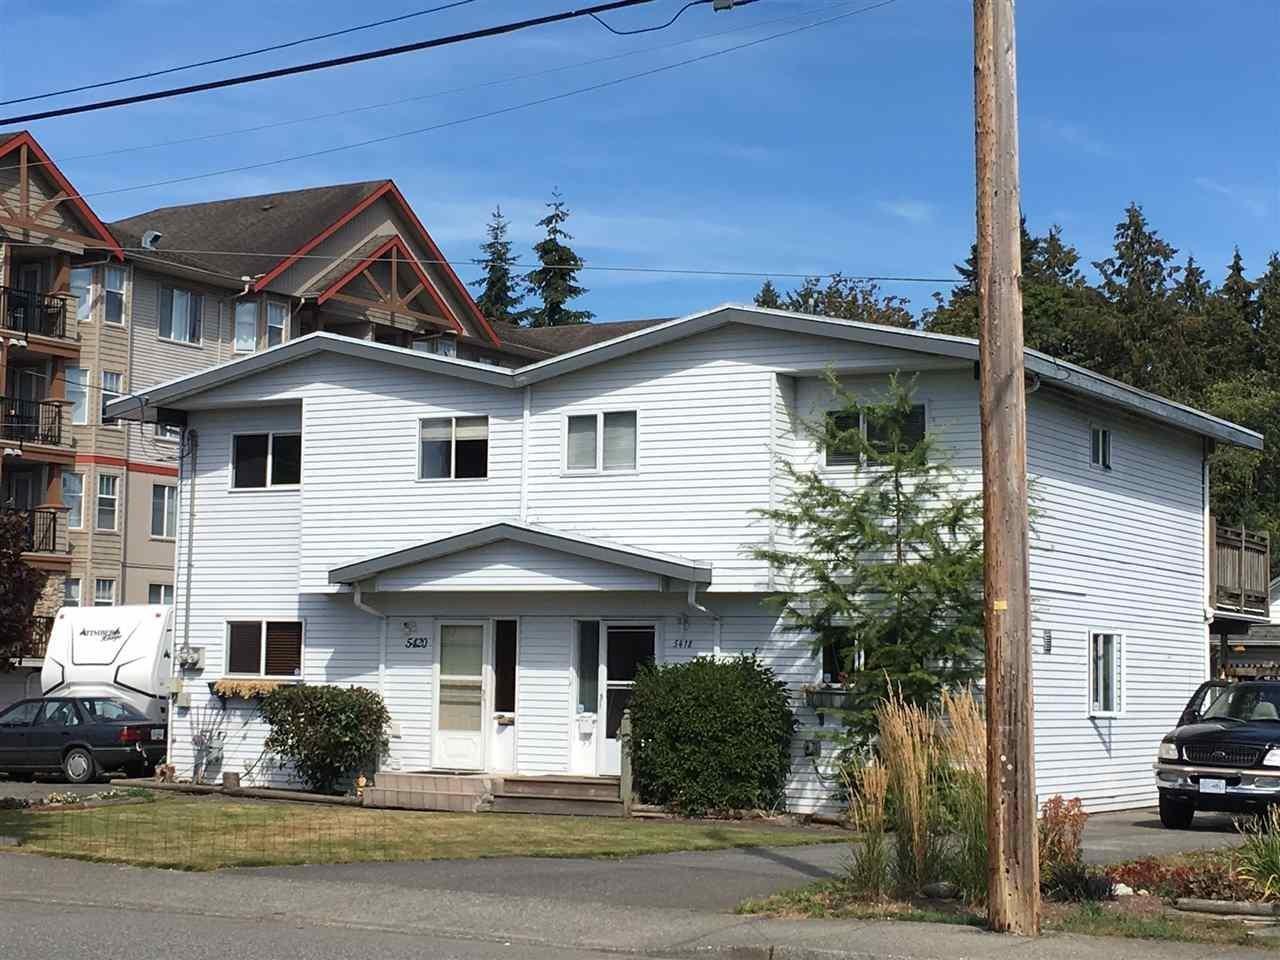 R2102896 - 5420 198 STREET, Langley City, Langley, BC - 1/2 Duplex